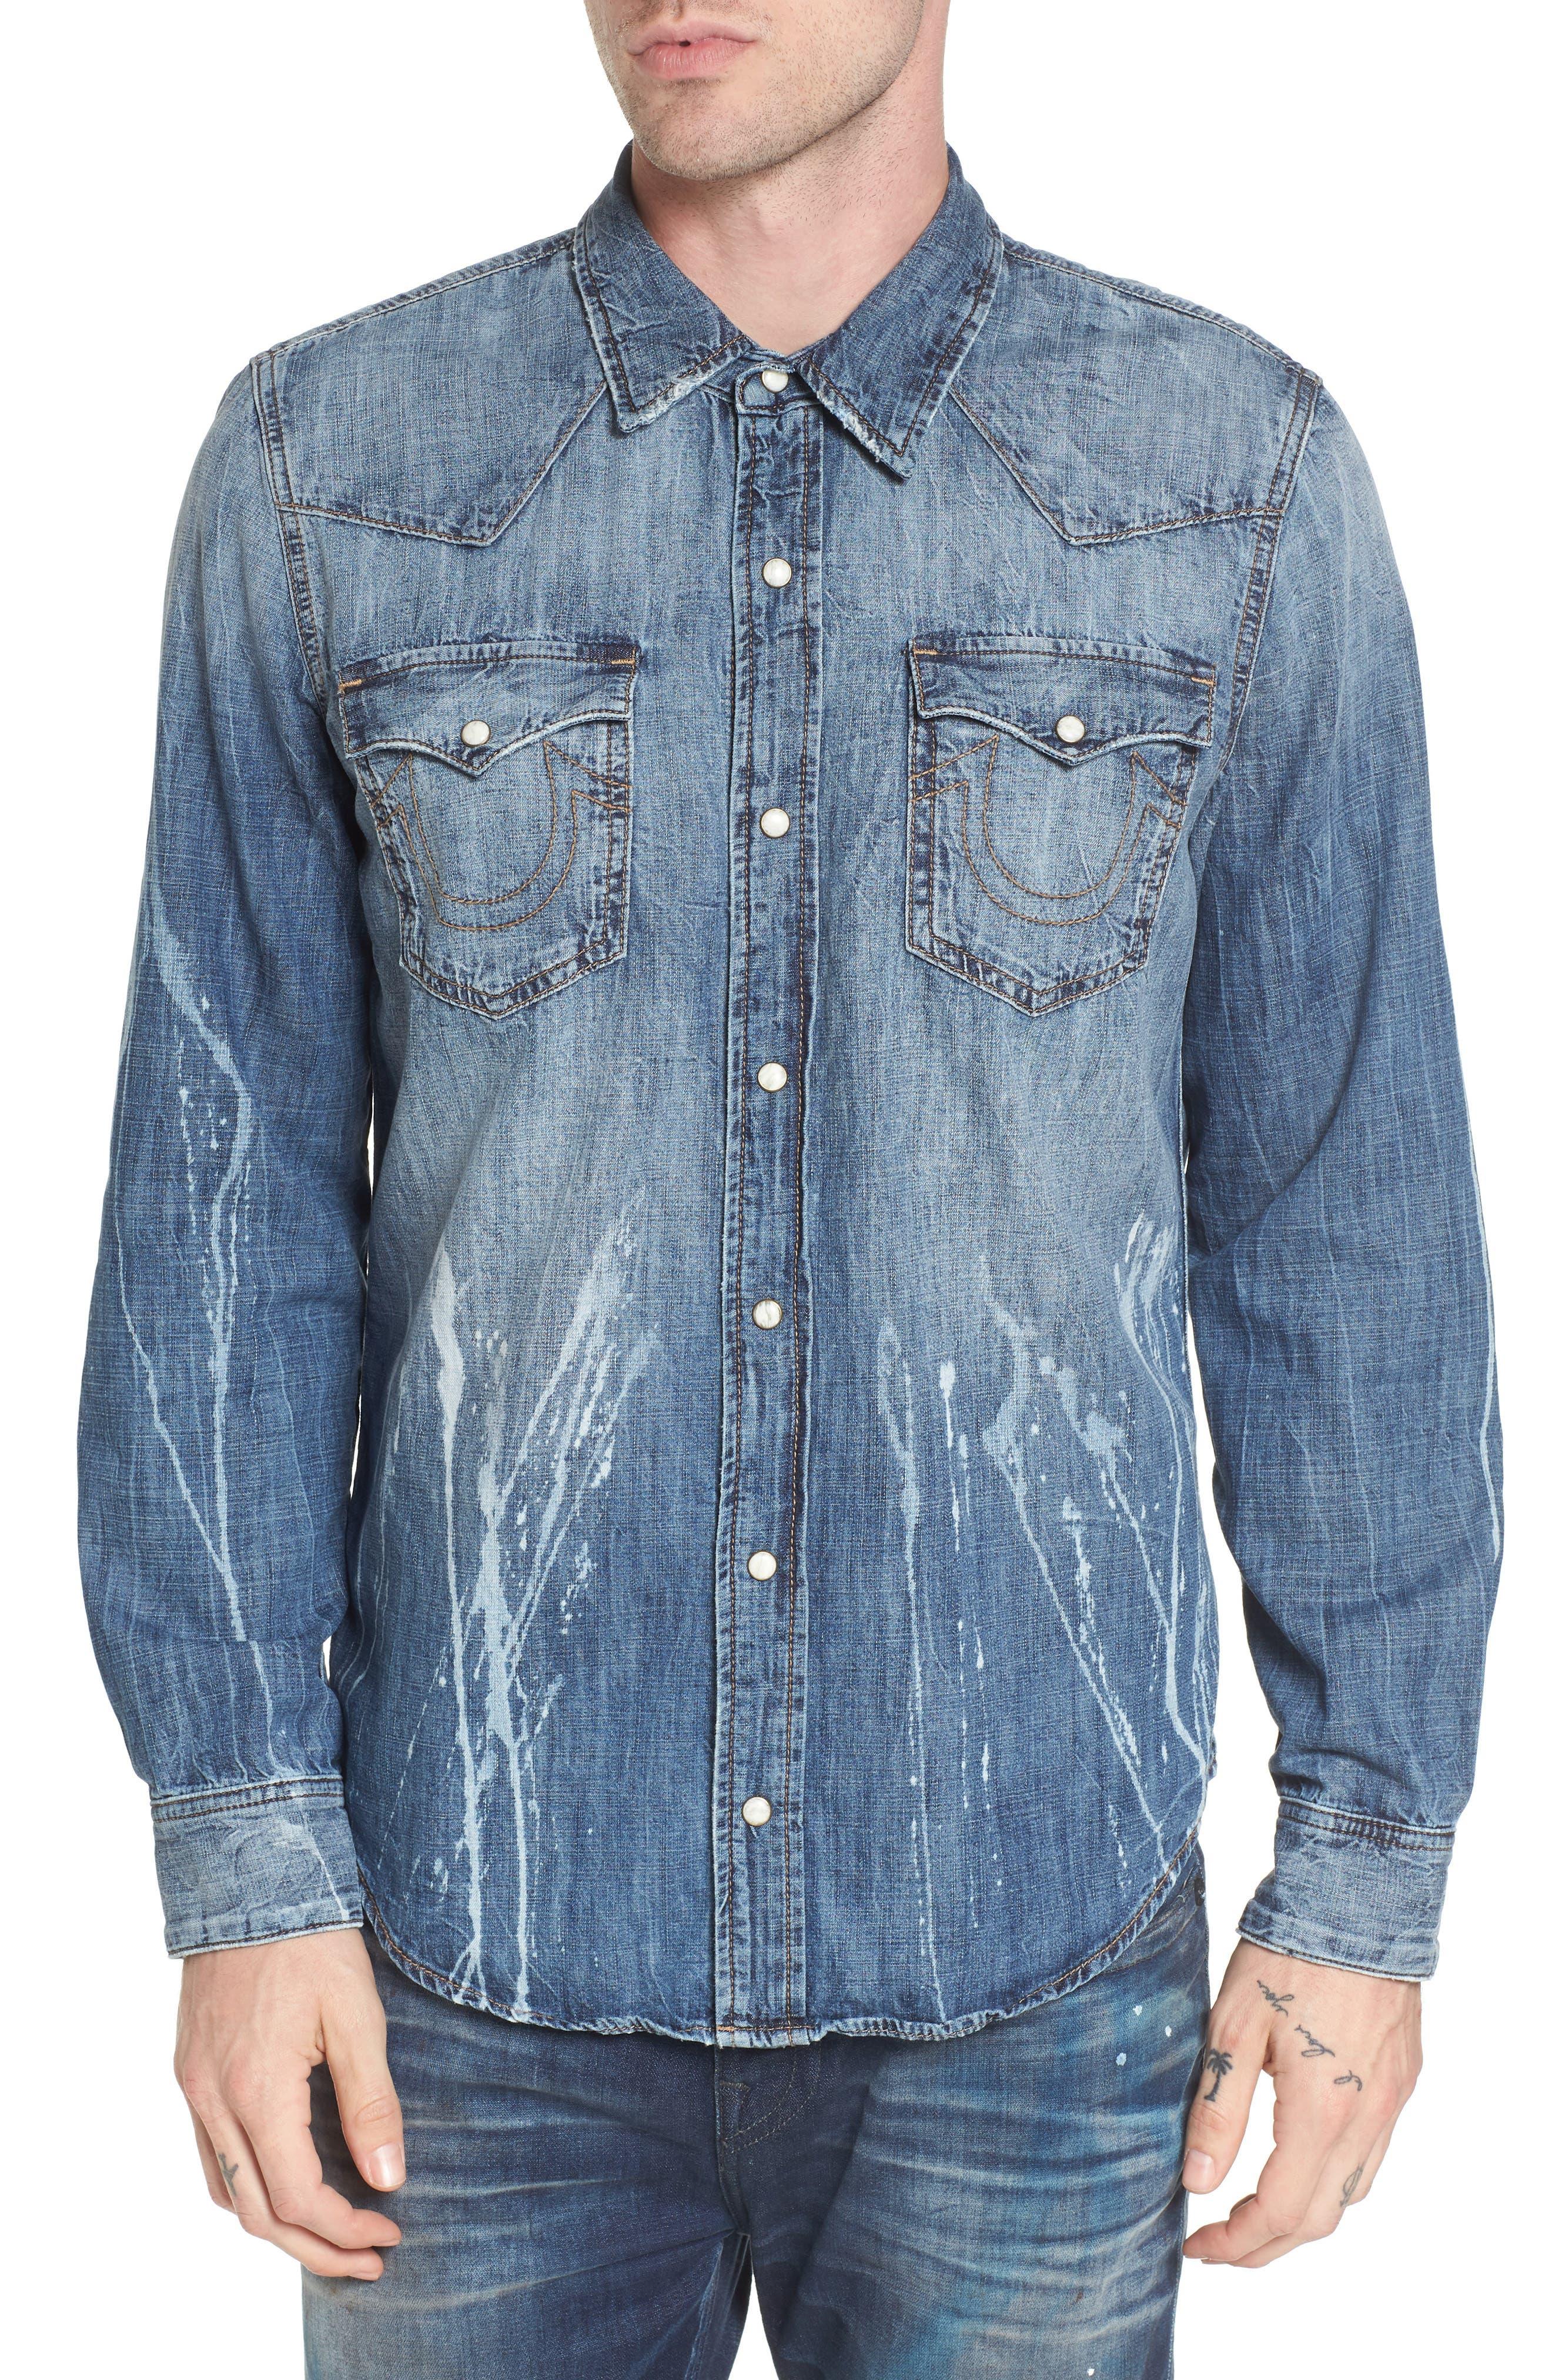 Alternate Image 1 Selected - True Religion Brand Jeans Ryan Runyon Rebel Long Sleeve Western Shirt